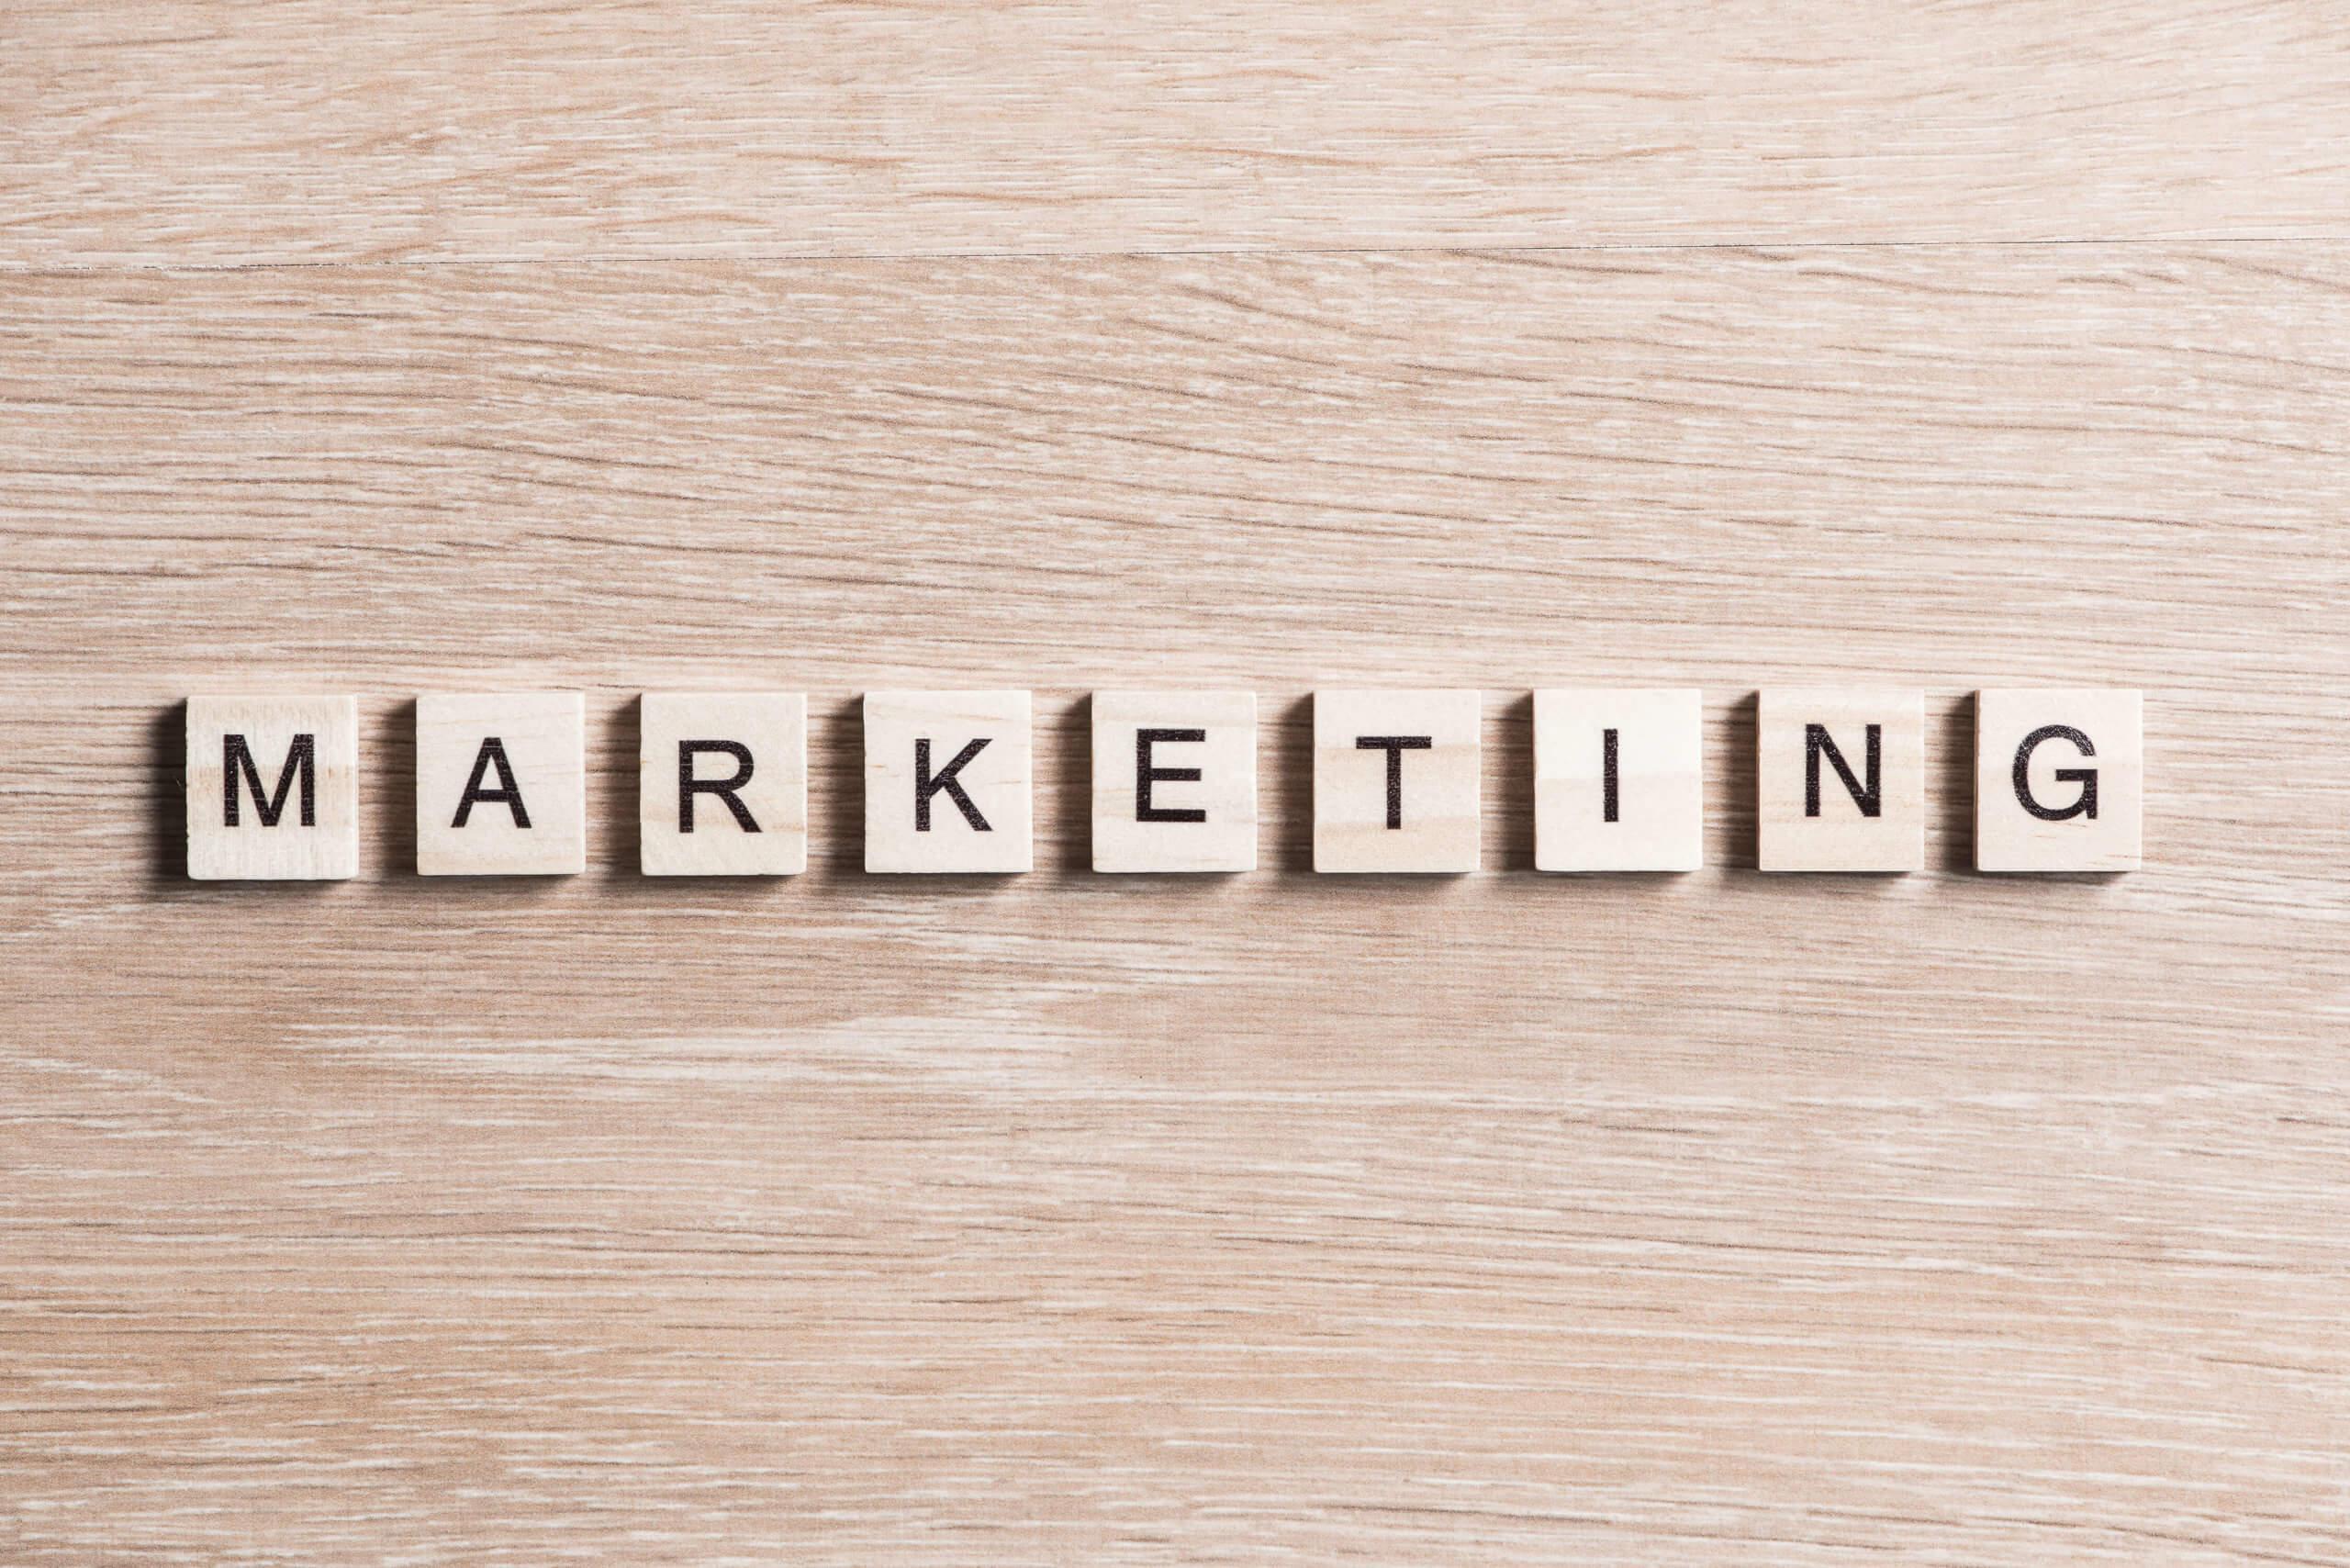 Marketing conceptual